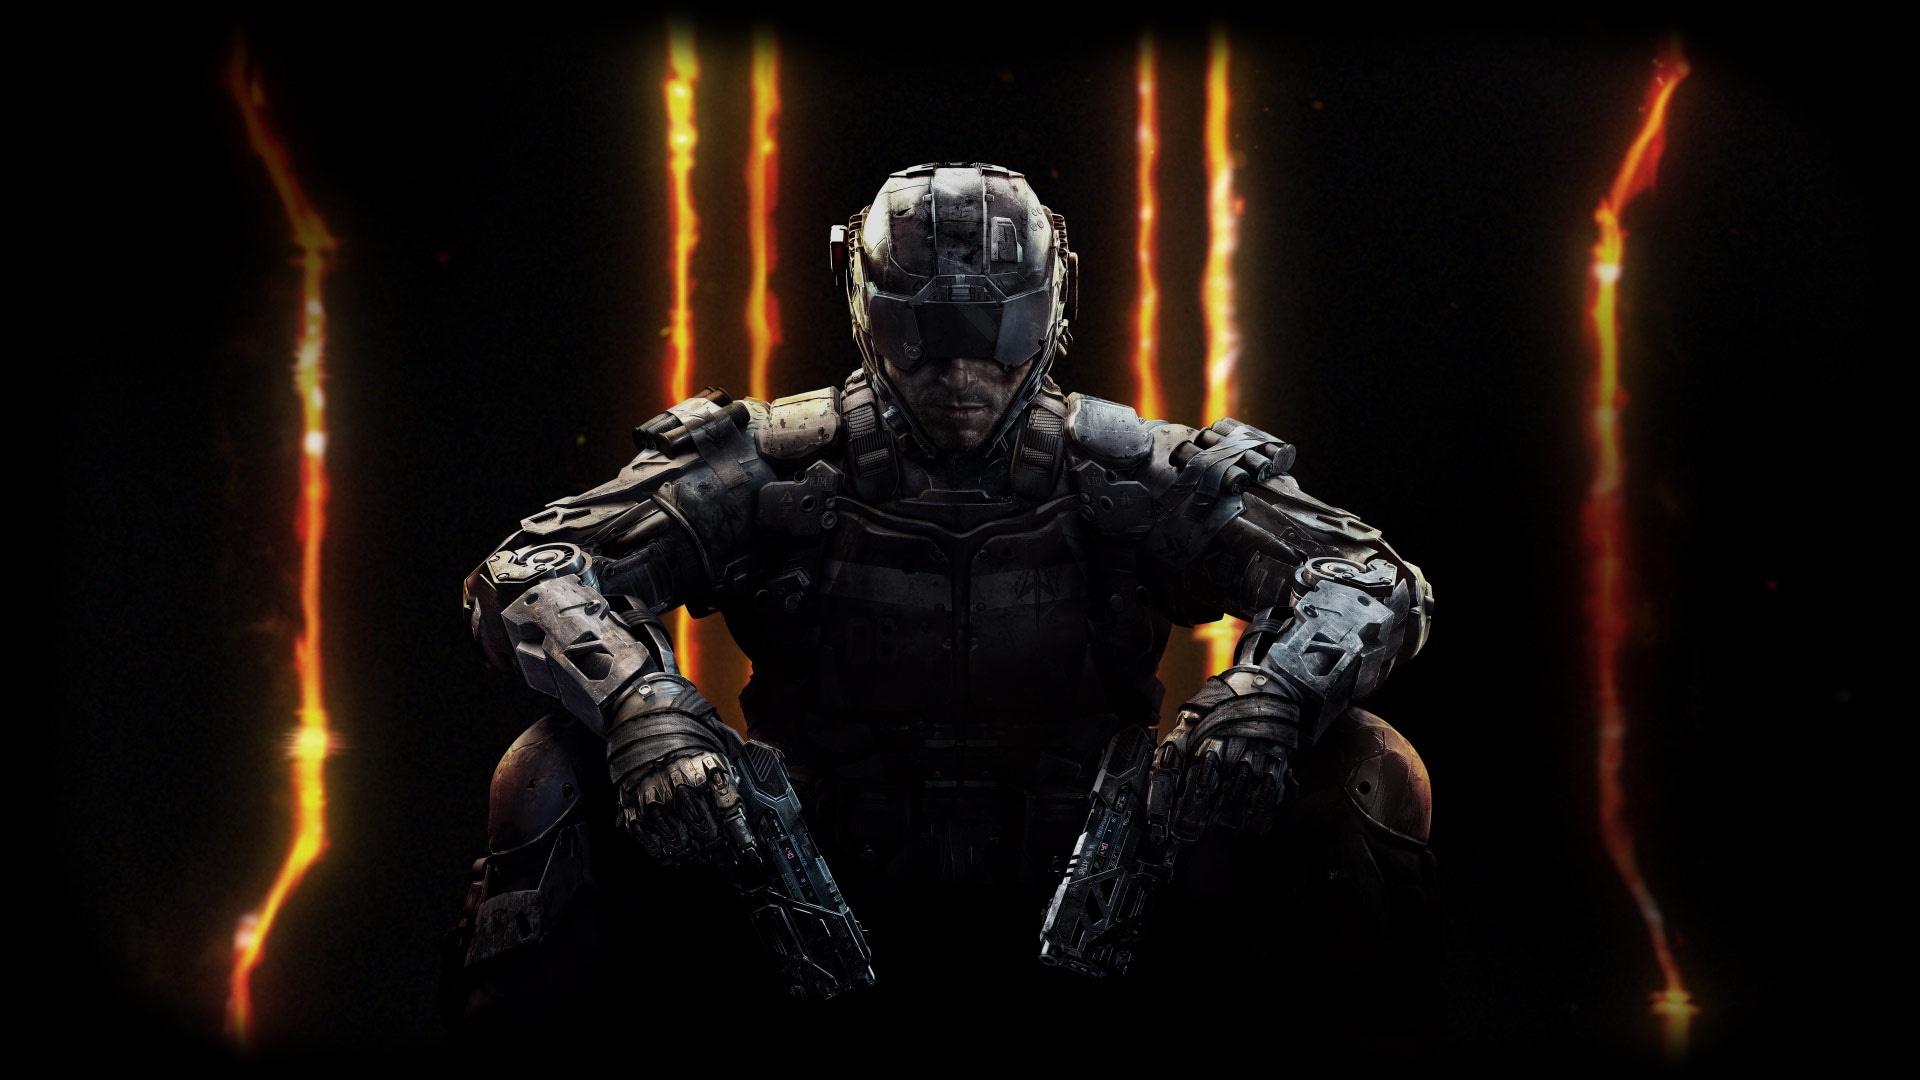 Call of Duty - Black Ops III - Wallpaper Full HD - 1920x1080